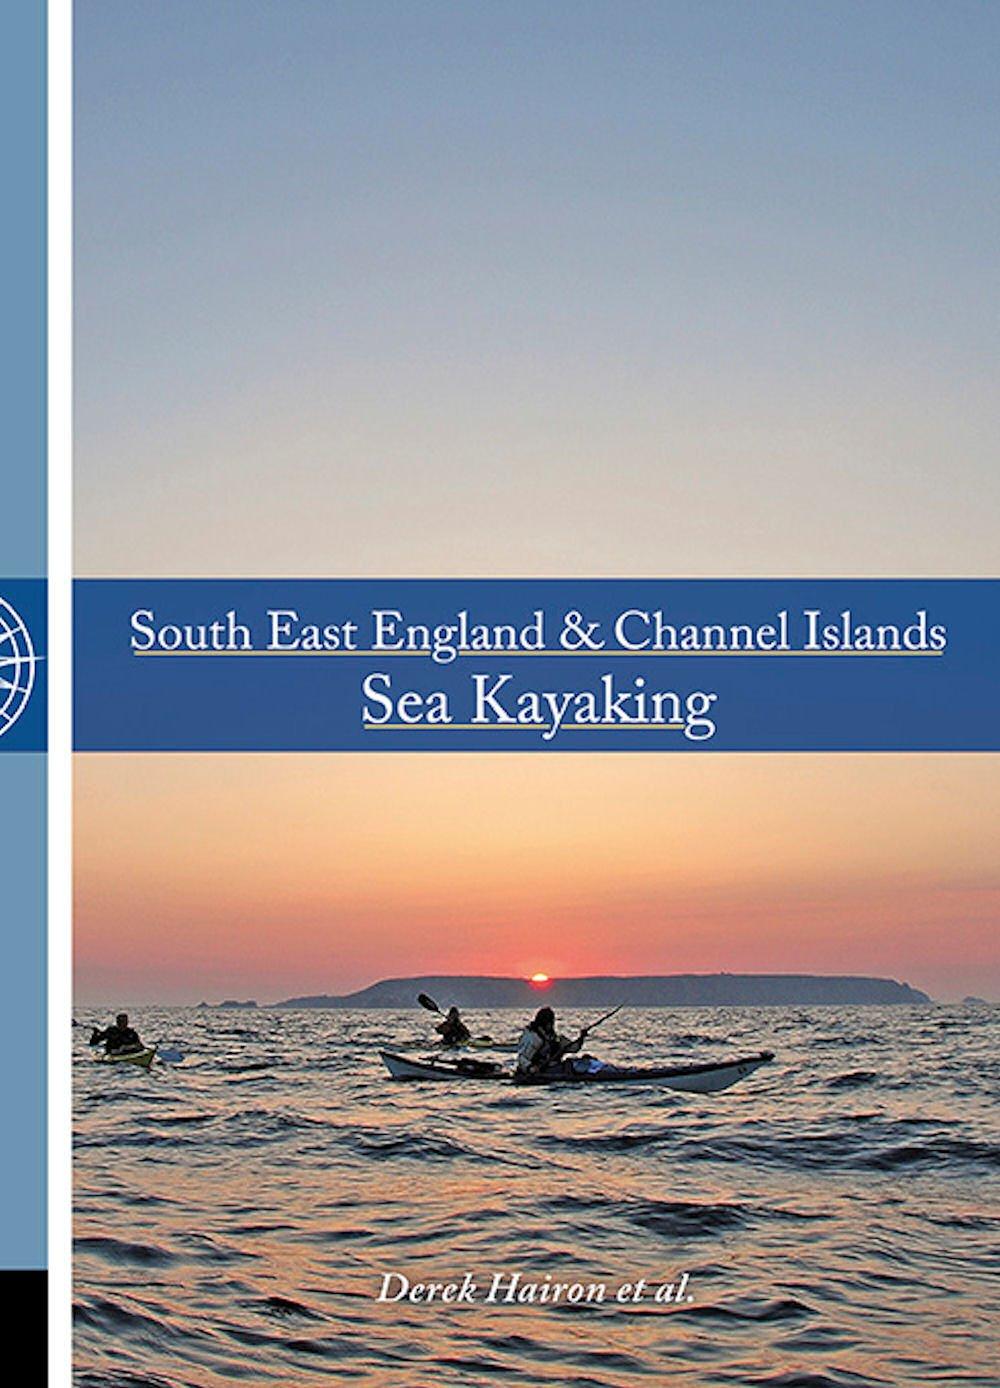 South East England & Channel Islands Sea Kayaking